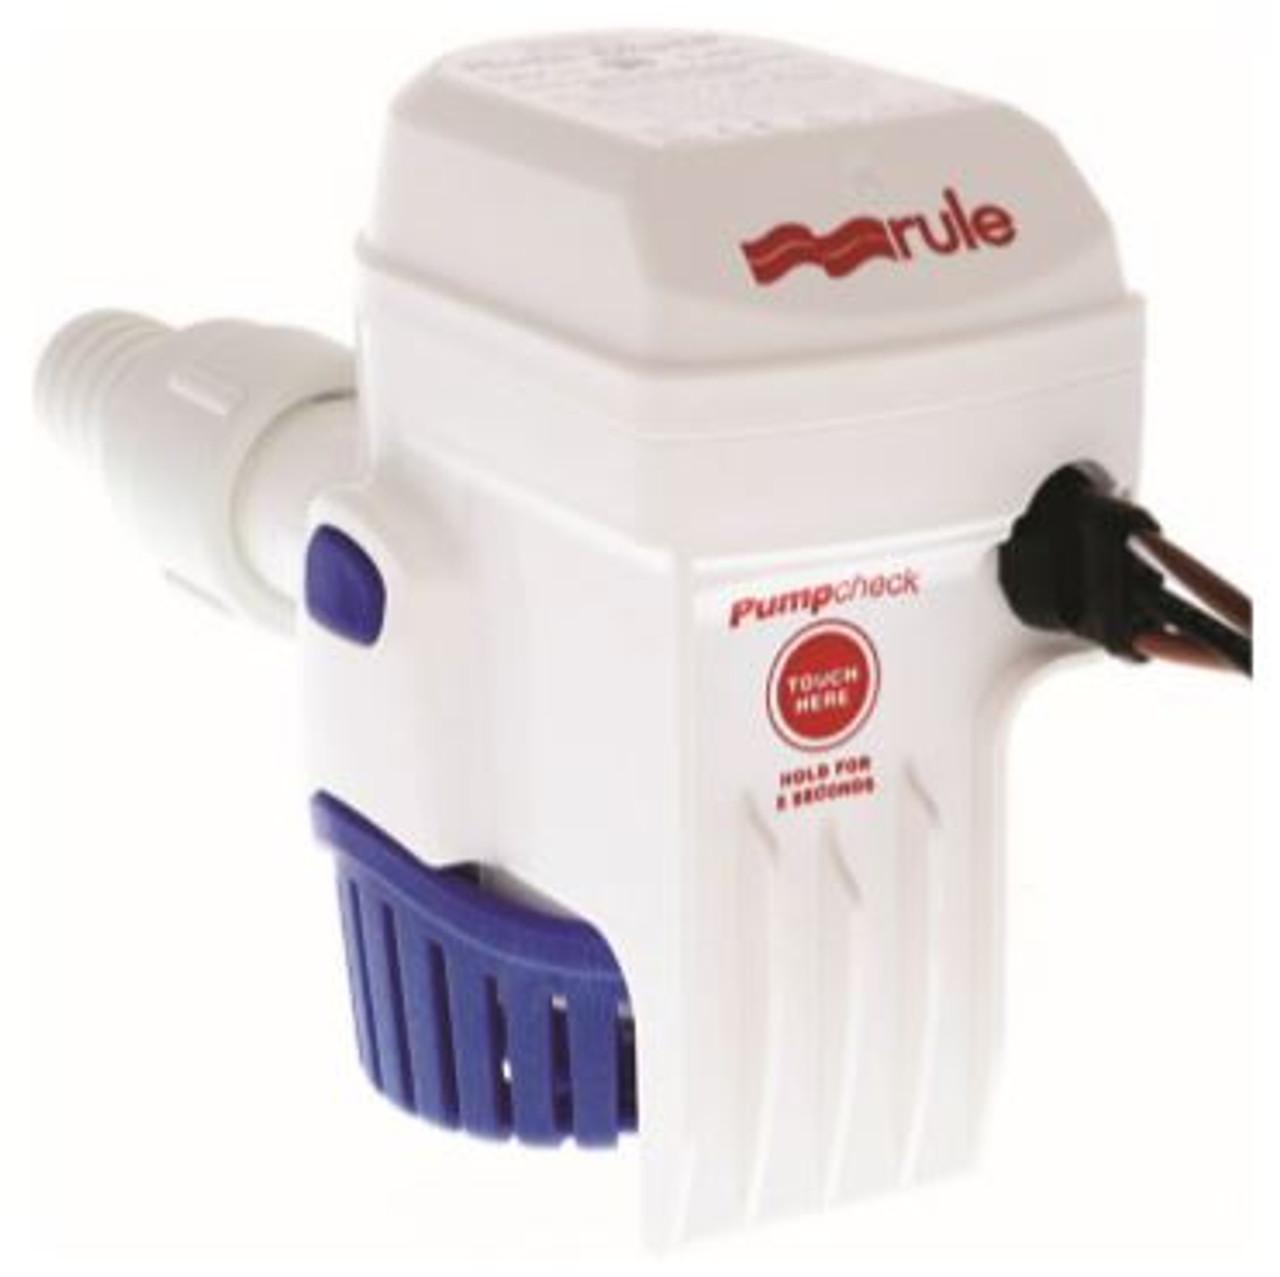 Rule-Mate Automatic 500 GPH Bilge Pump 24v